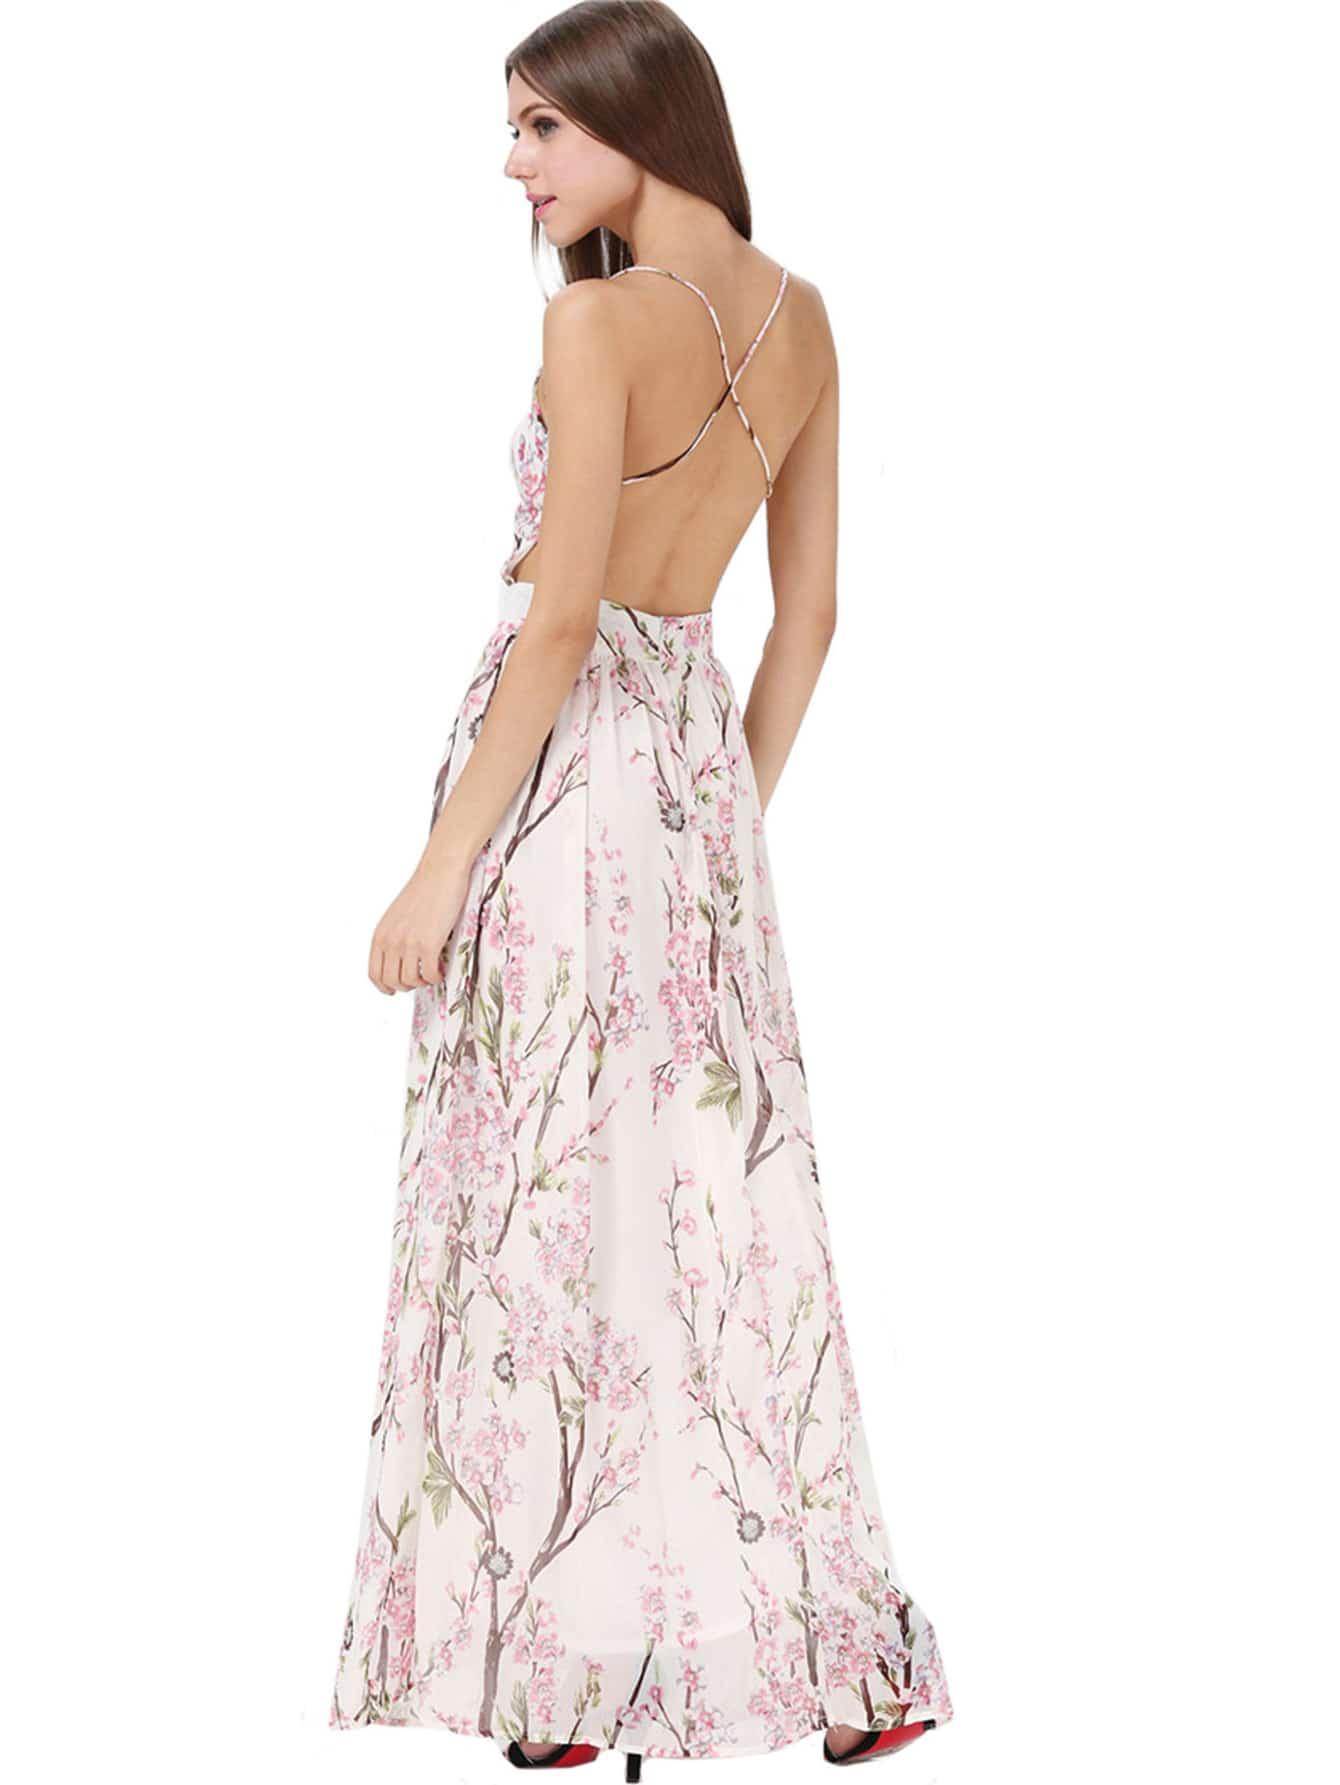 Hibiscus Florals V-neck Spaghetti Straps Backless Maxi Dress -SheIn(Sheinside)